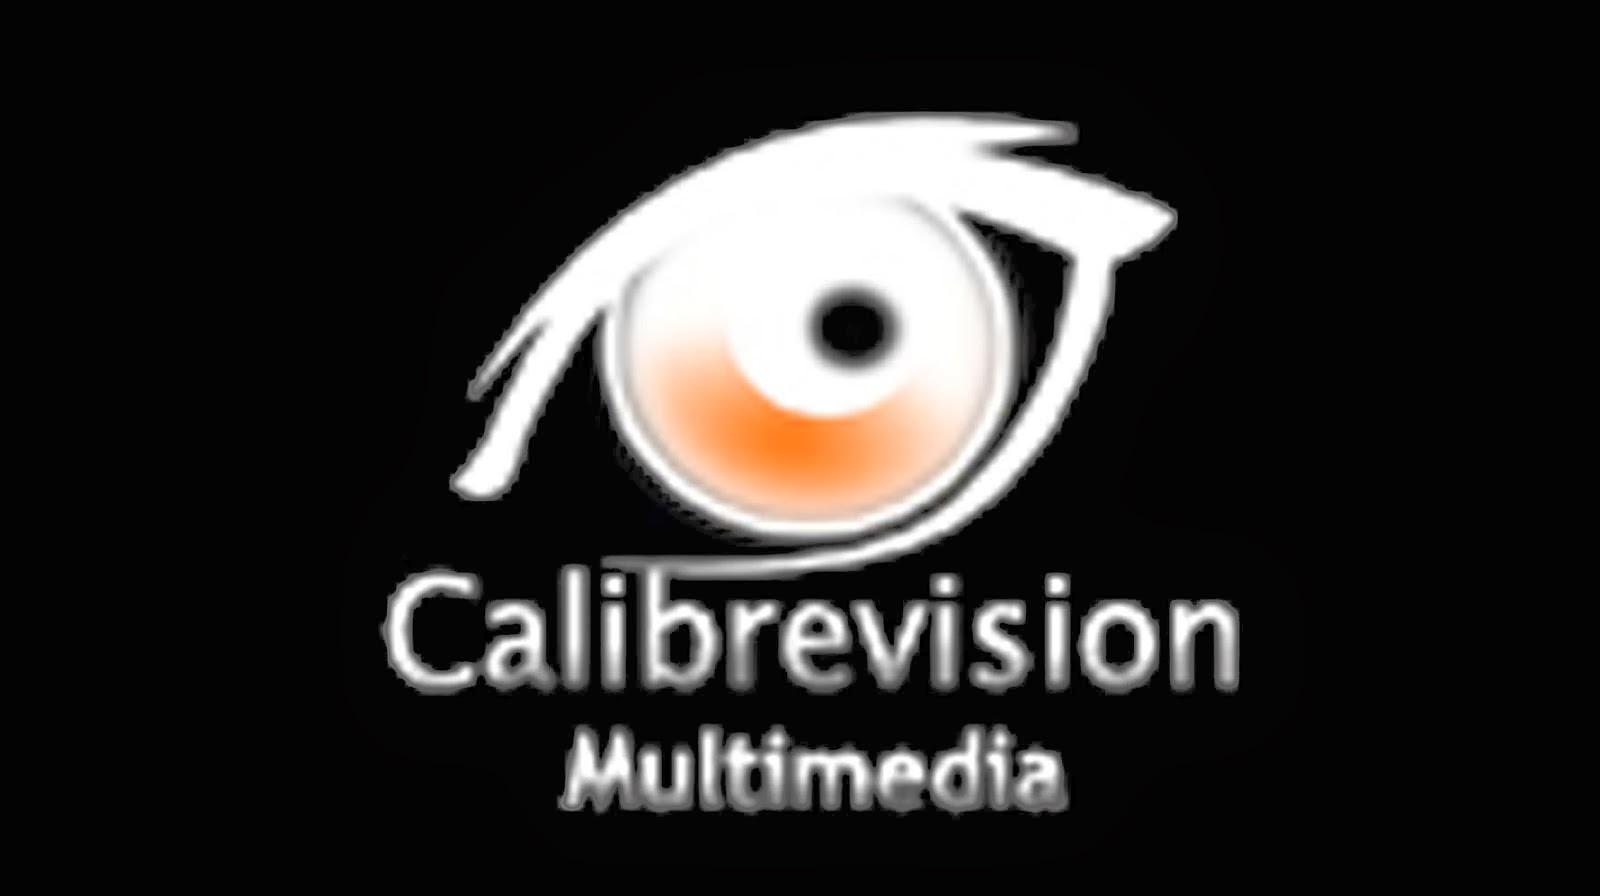 Calibrevision